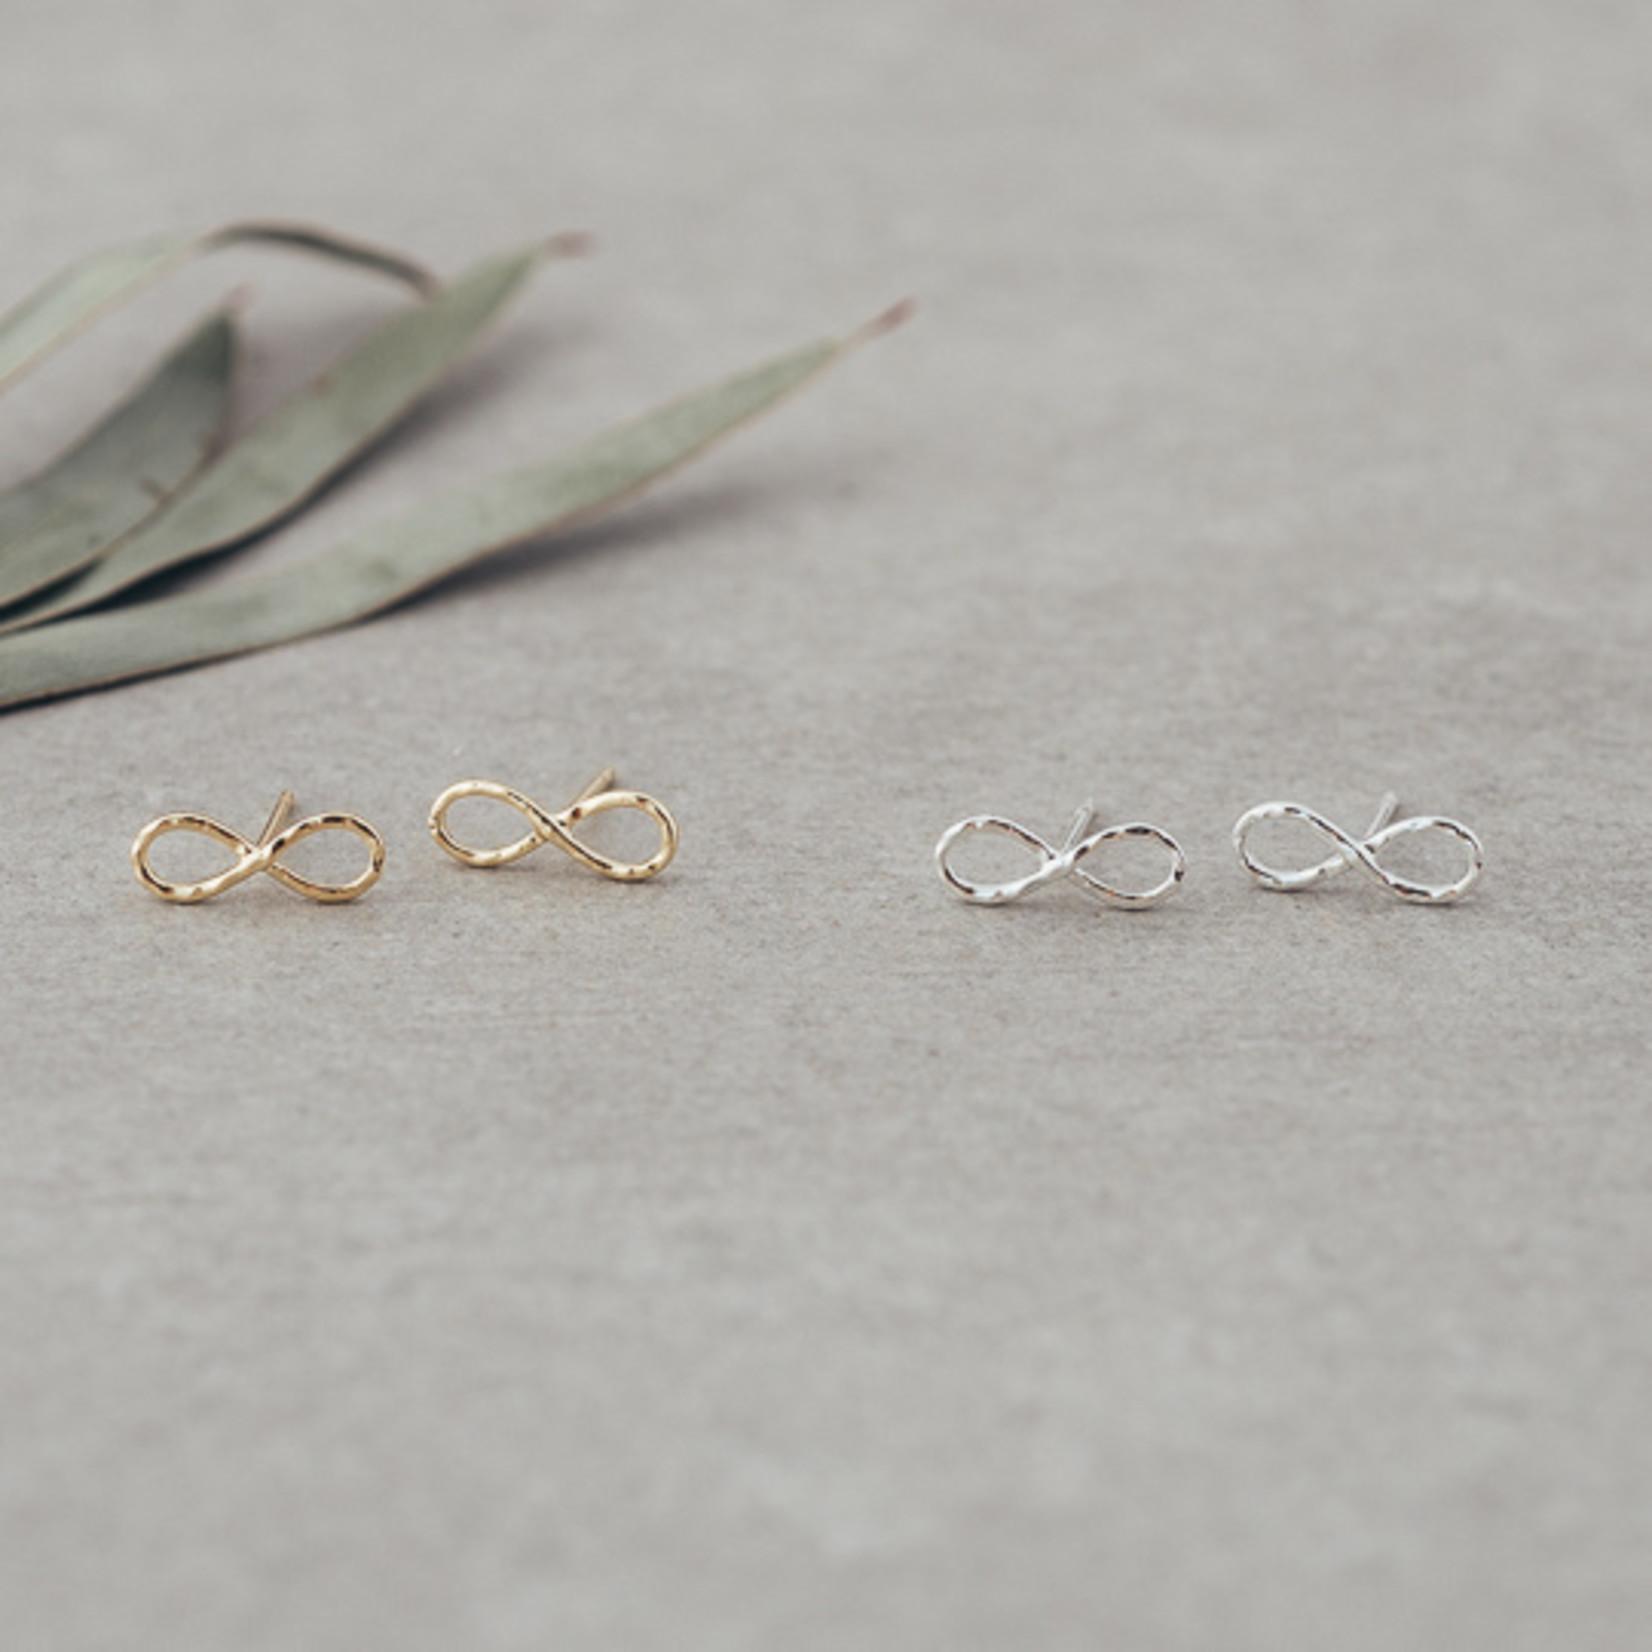 Glee Jewelry ~ Infinity Studs